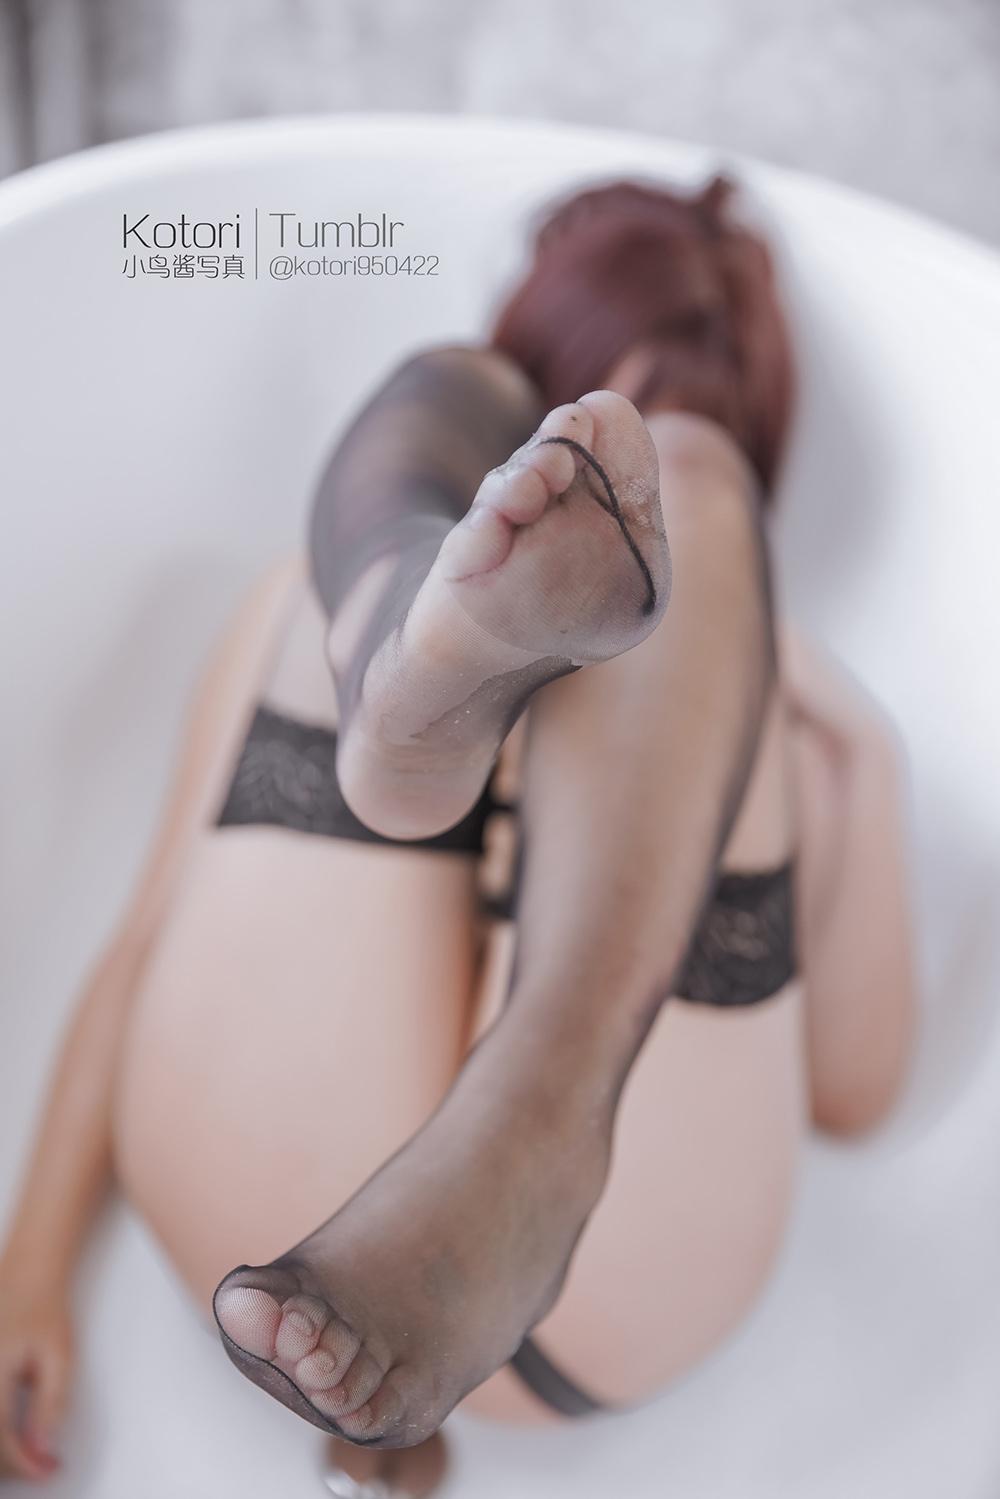 dLxlcC - Cosplay girl PR社 福利姬 小鸟酱系列–黑色束缚衣